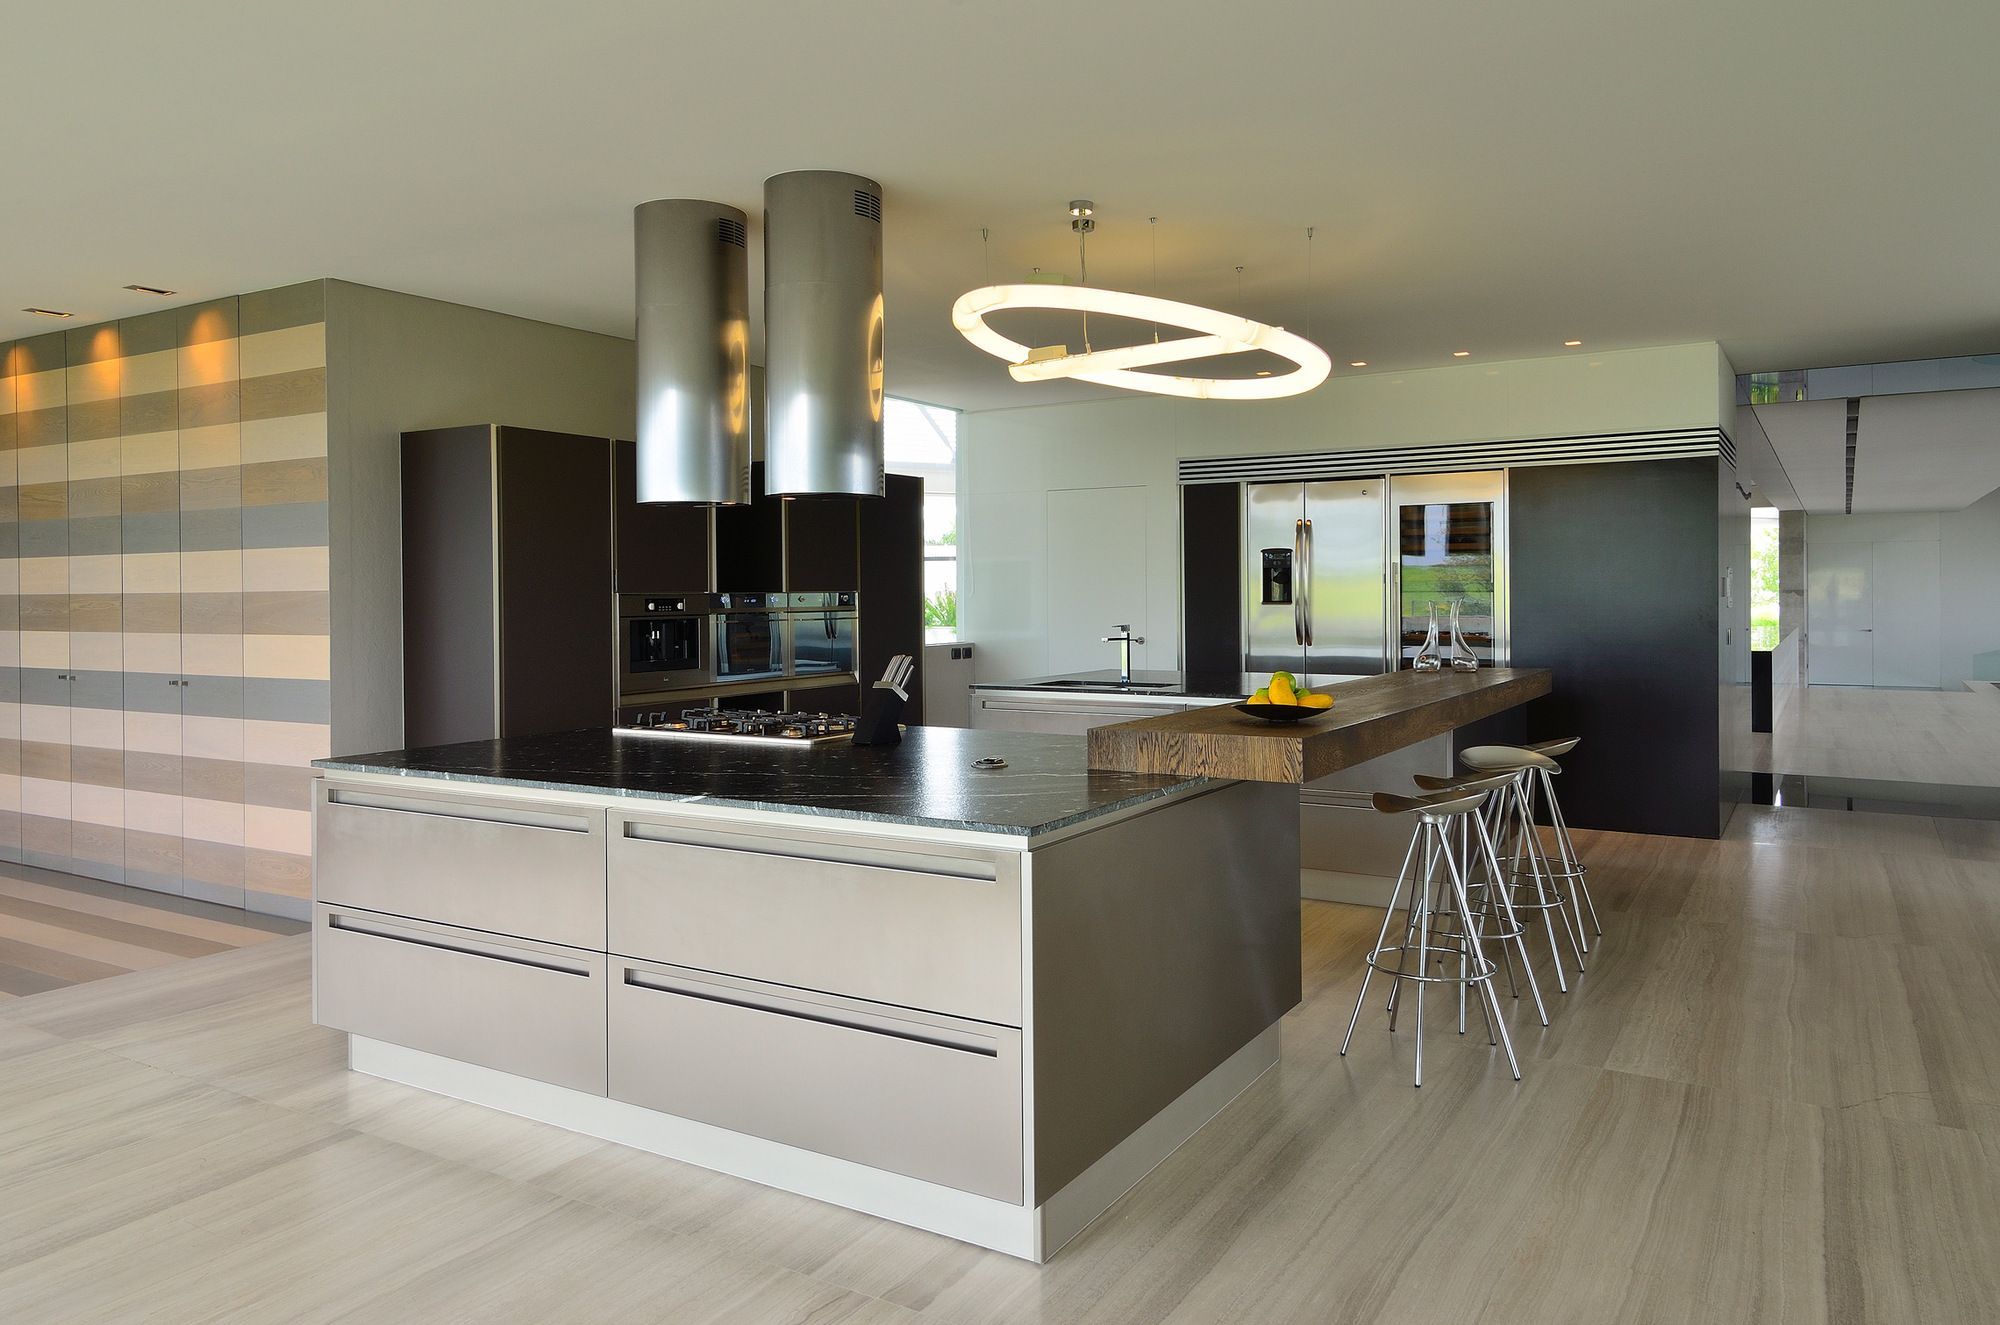 Casa jerbana reims arquitectura cuisine arquitectura for Cremefarbene kuche welche wandfarbe